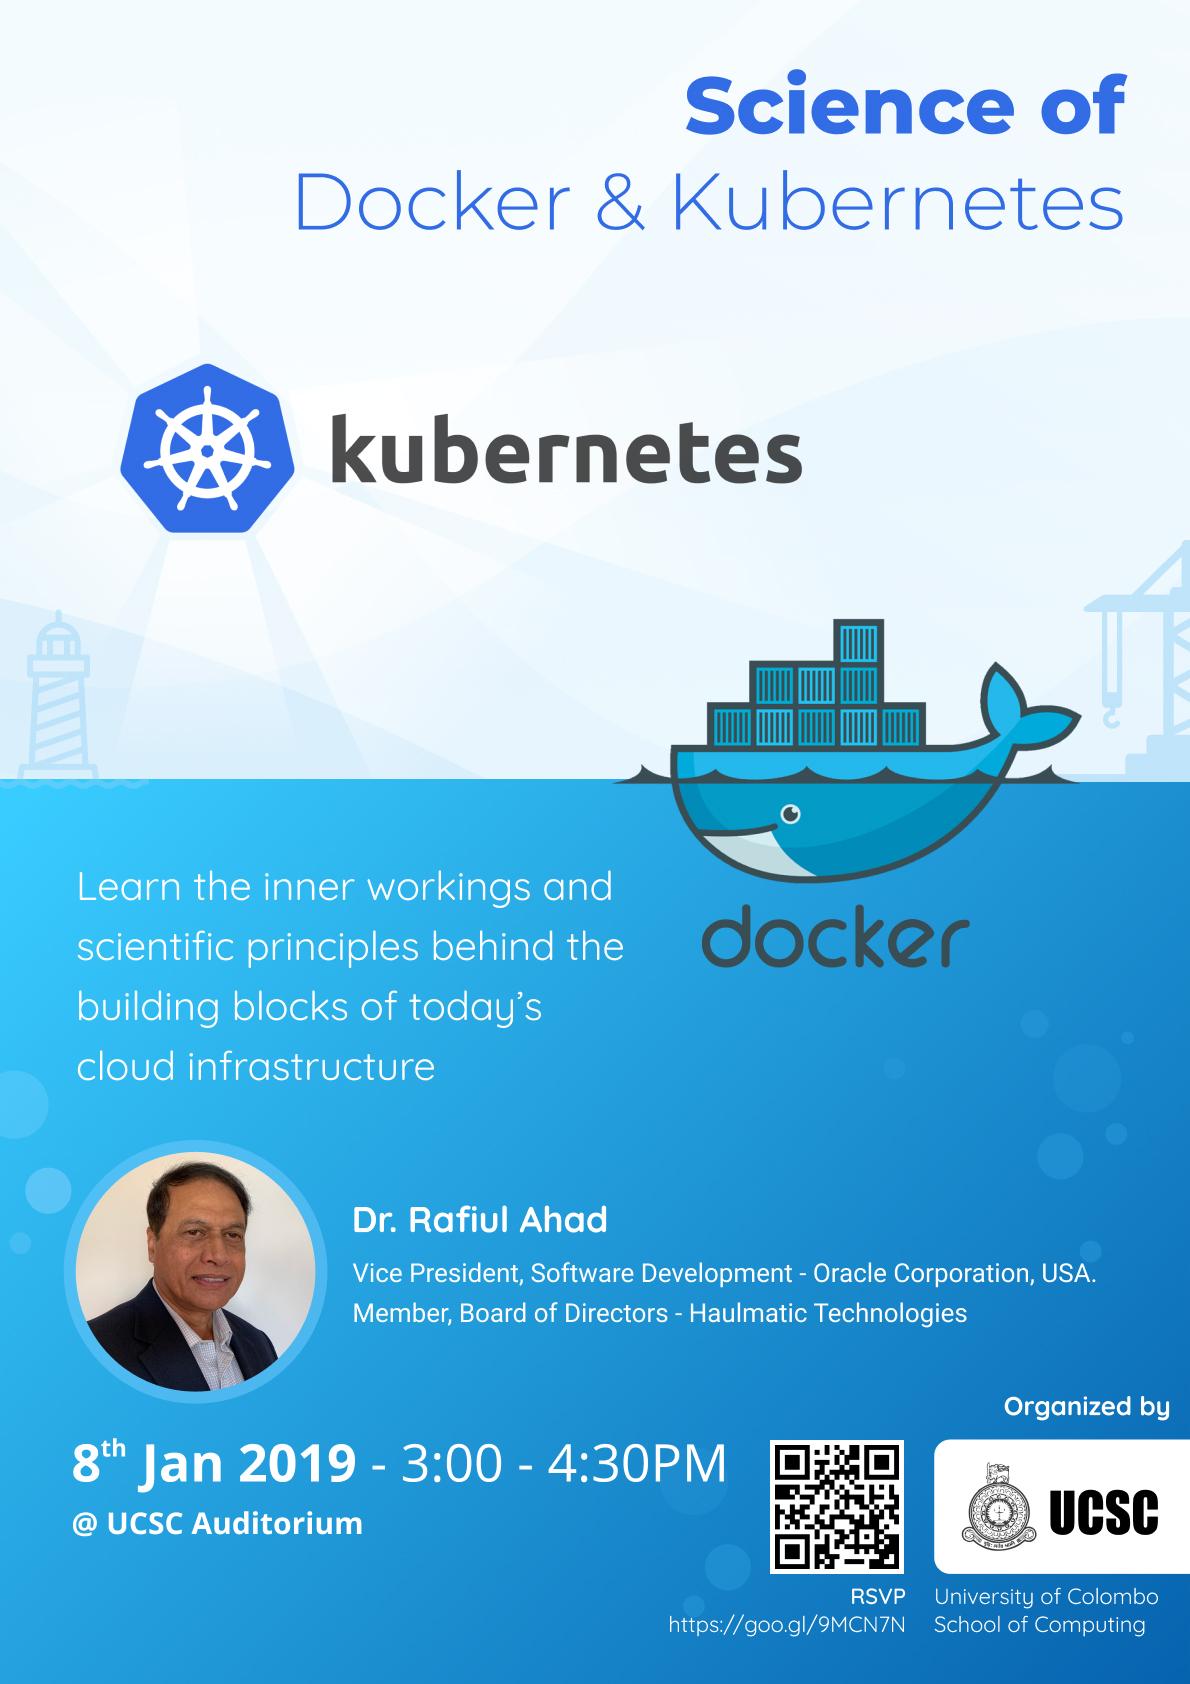 Science of Docker & Kubernetes - UCSC